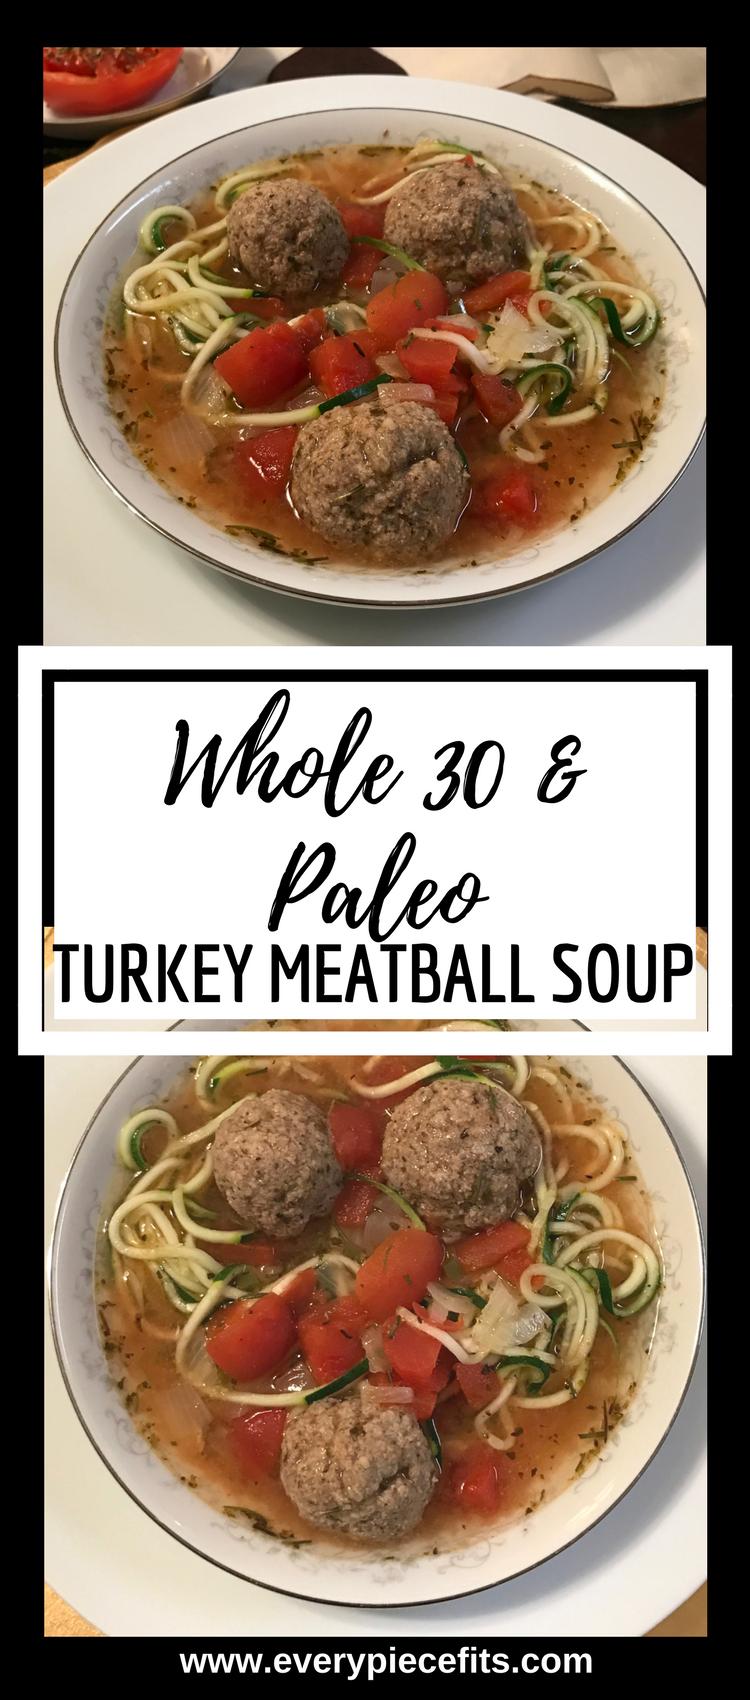 Whole 30 Turkey Meatball Soup.png